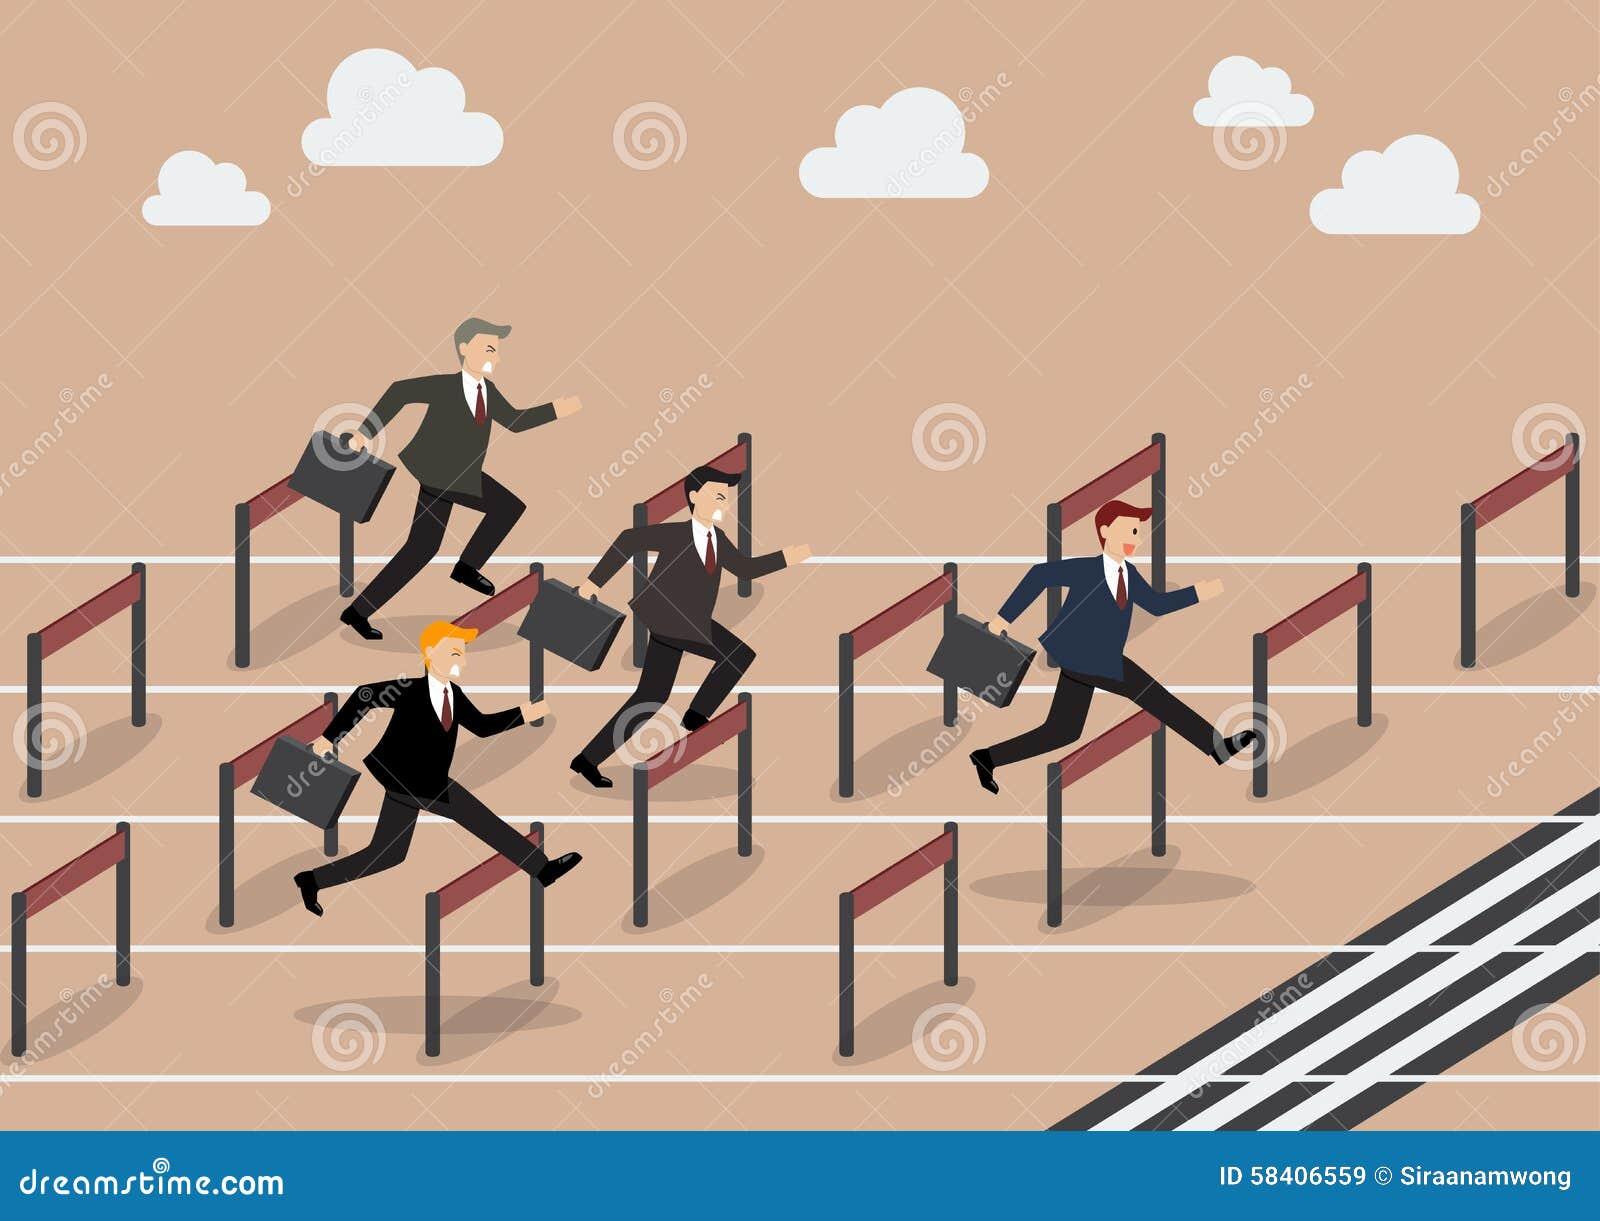 businessman race hurdle competition stock vector image hurdle race clipart Hurdle Silhouette